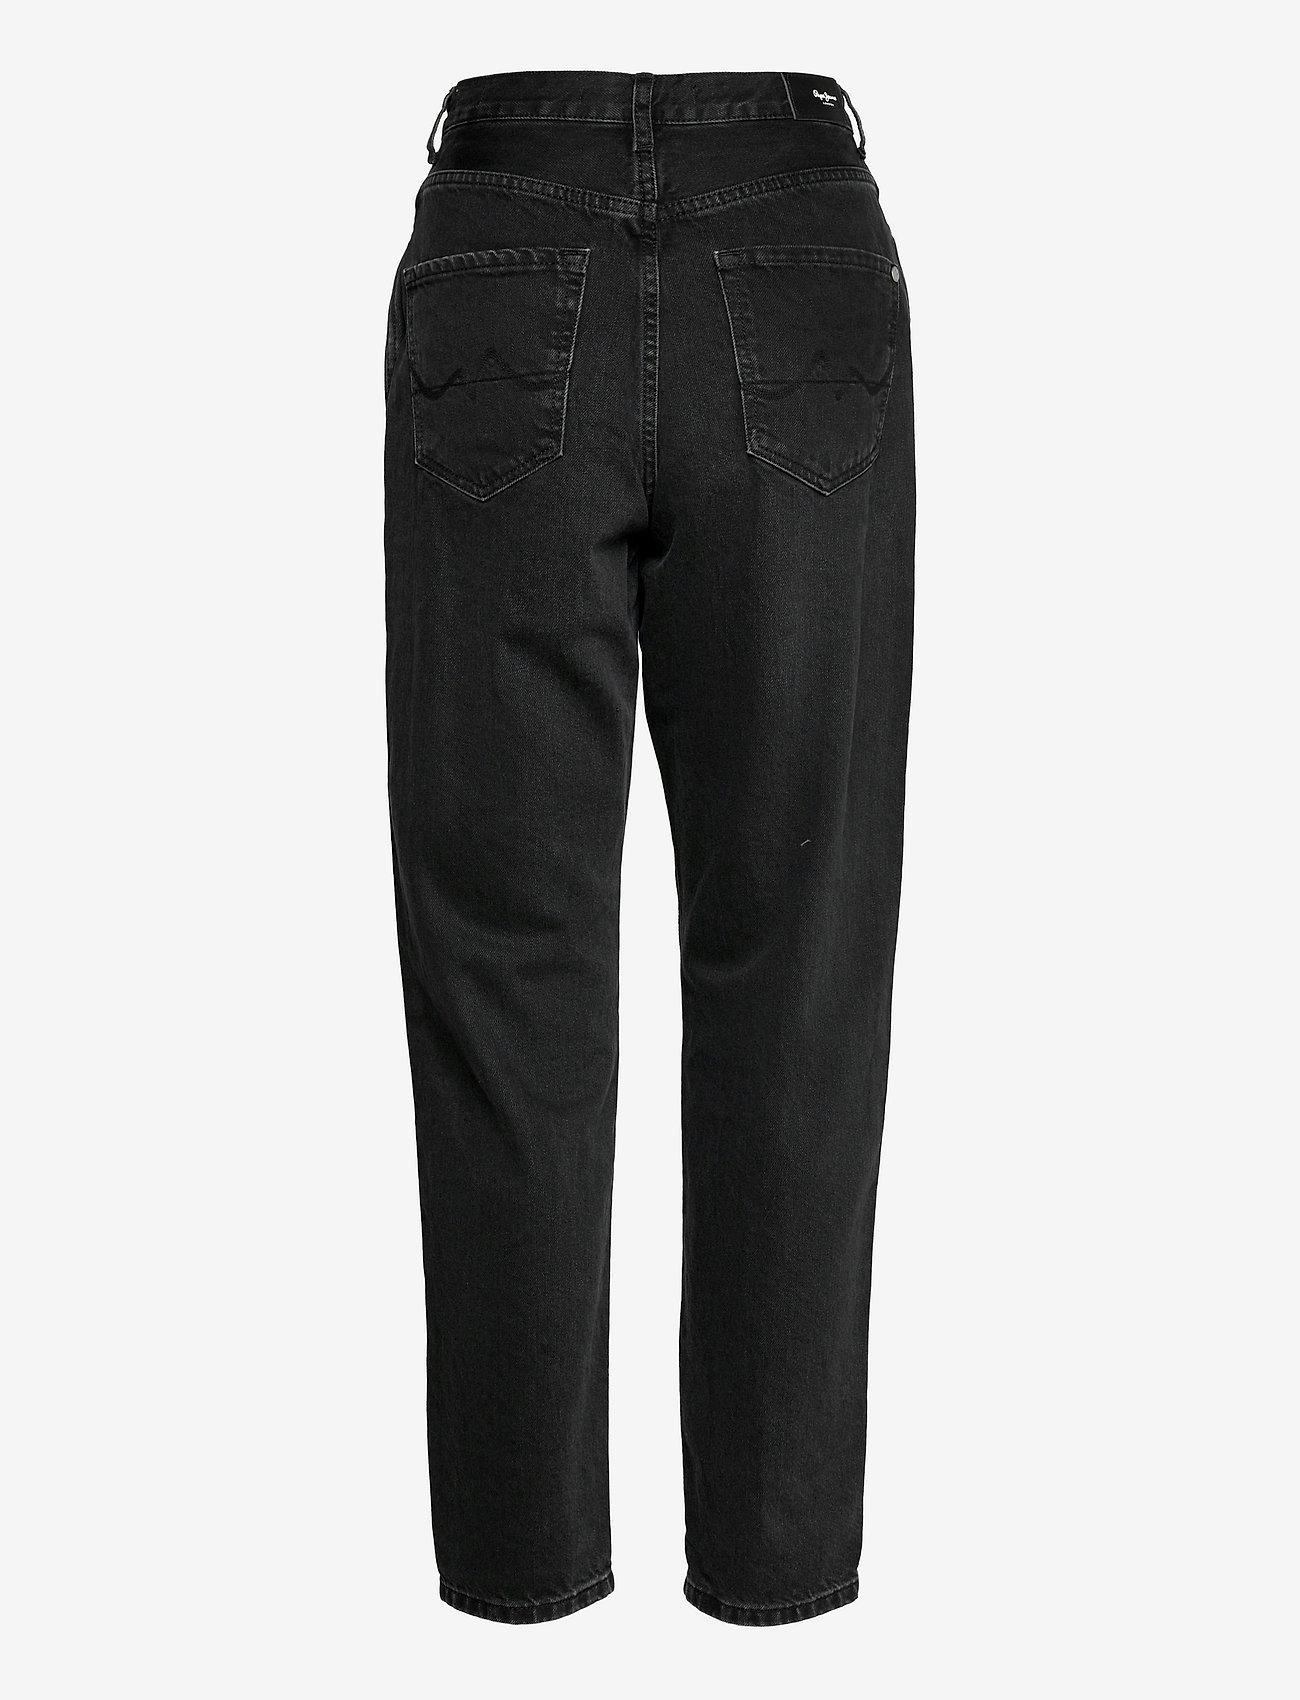 Pepe Jeans London - RACHEL - mammajeans - denim - 1